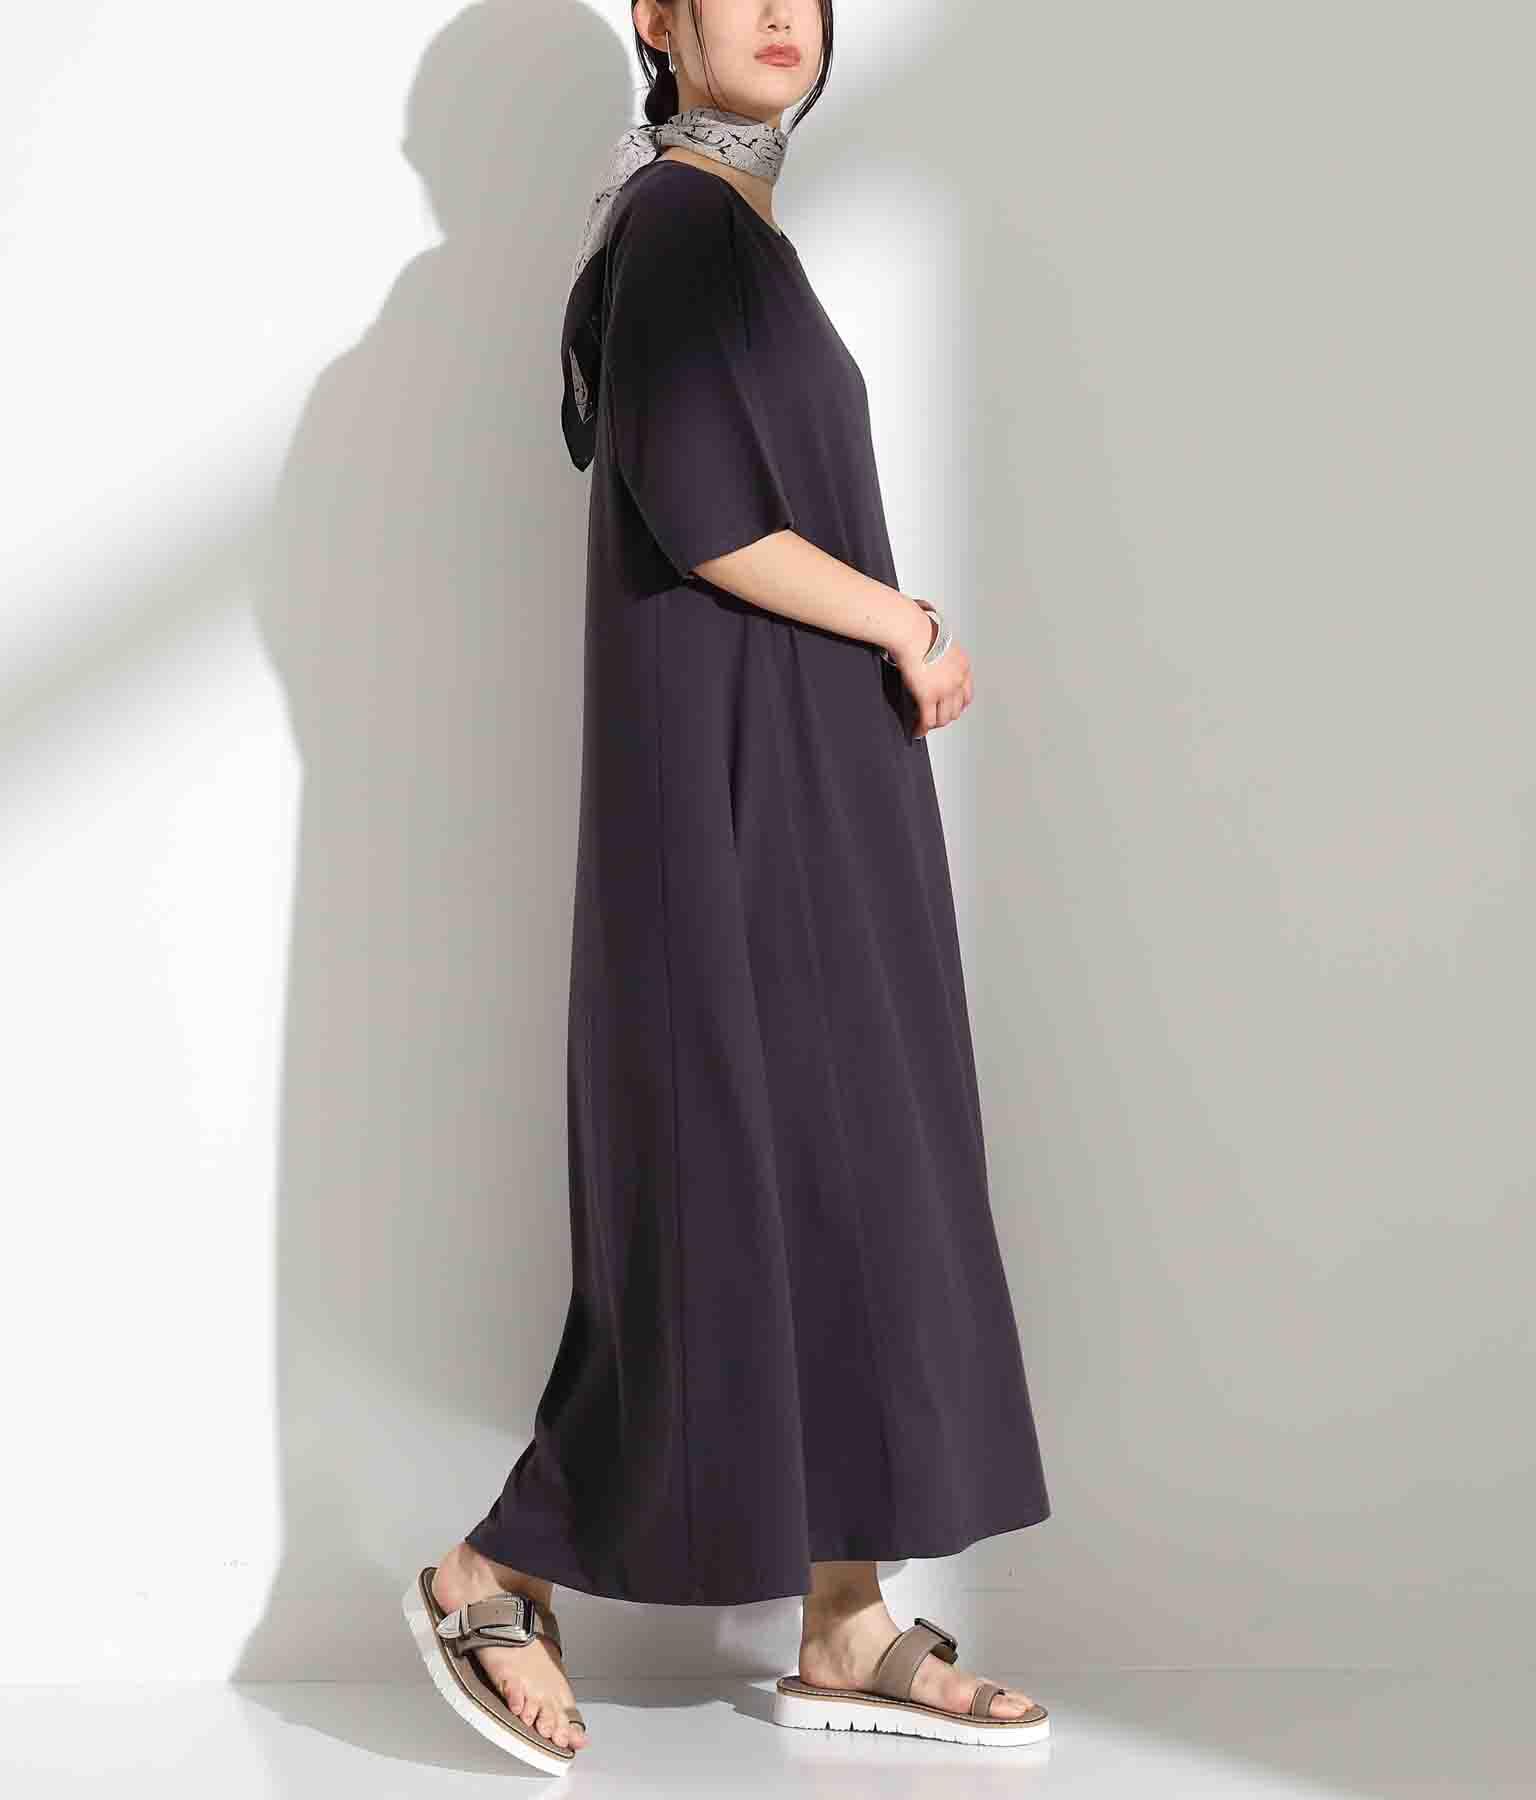 Aラインオーガニックコットンワンピース(ワンピース・ドレス/ロングワンピ) | Alluge